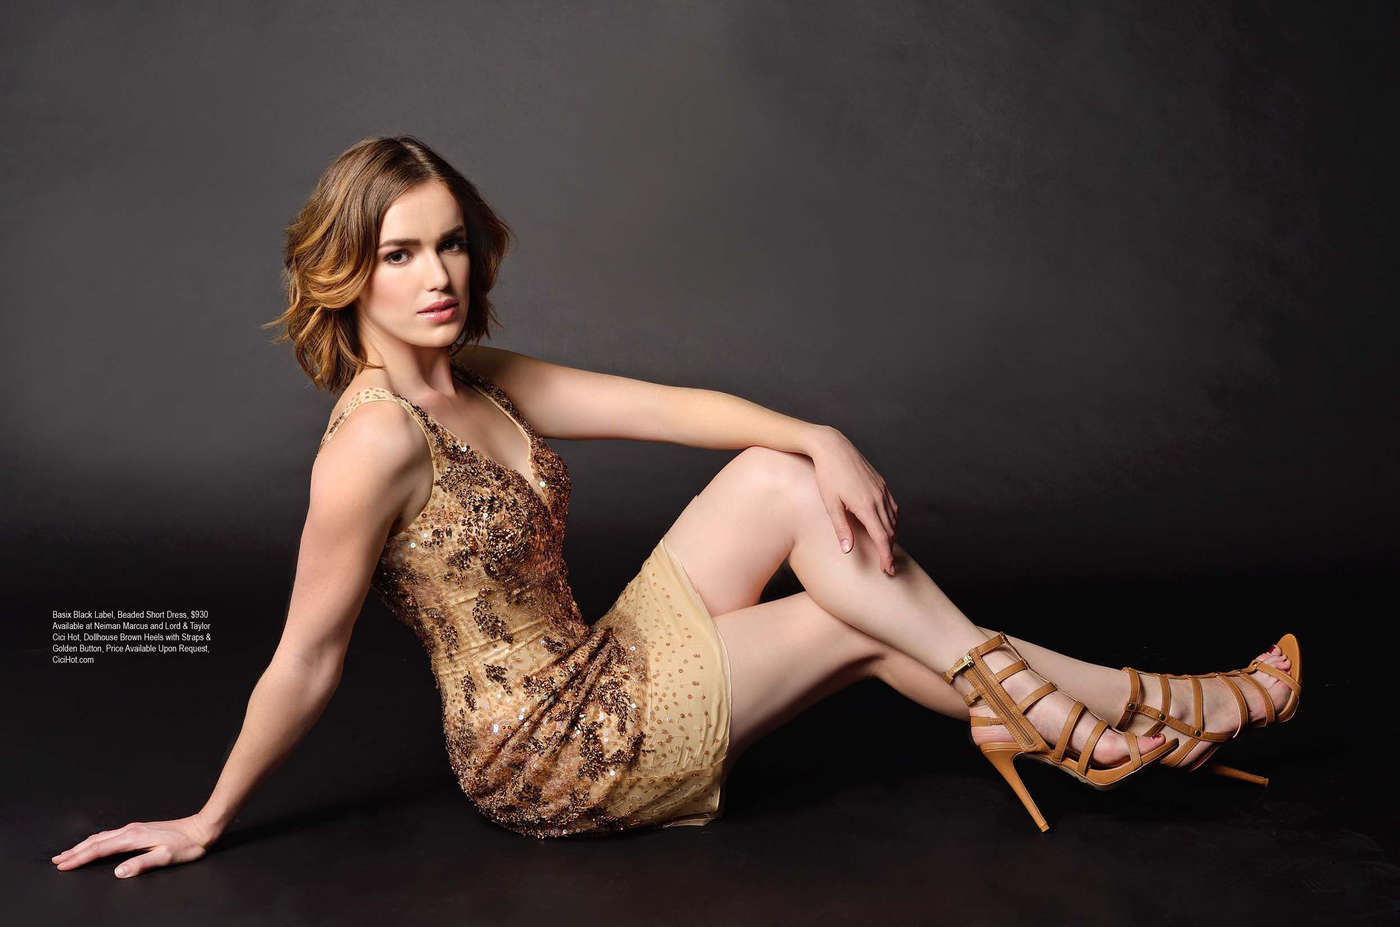 Elizabeth Henstridge en mini-robe décolletée